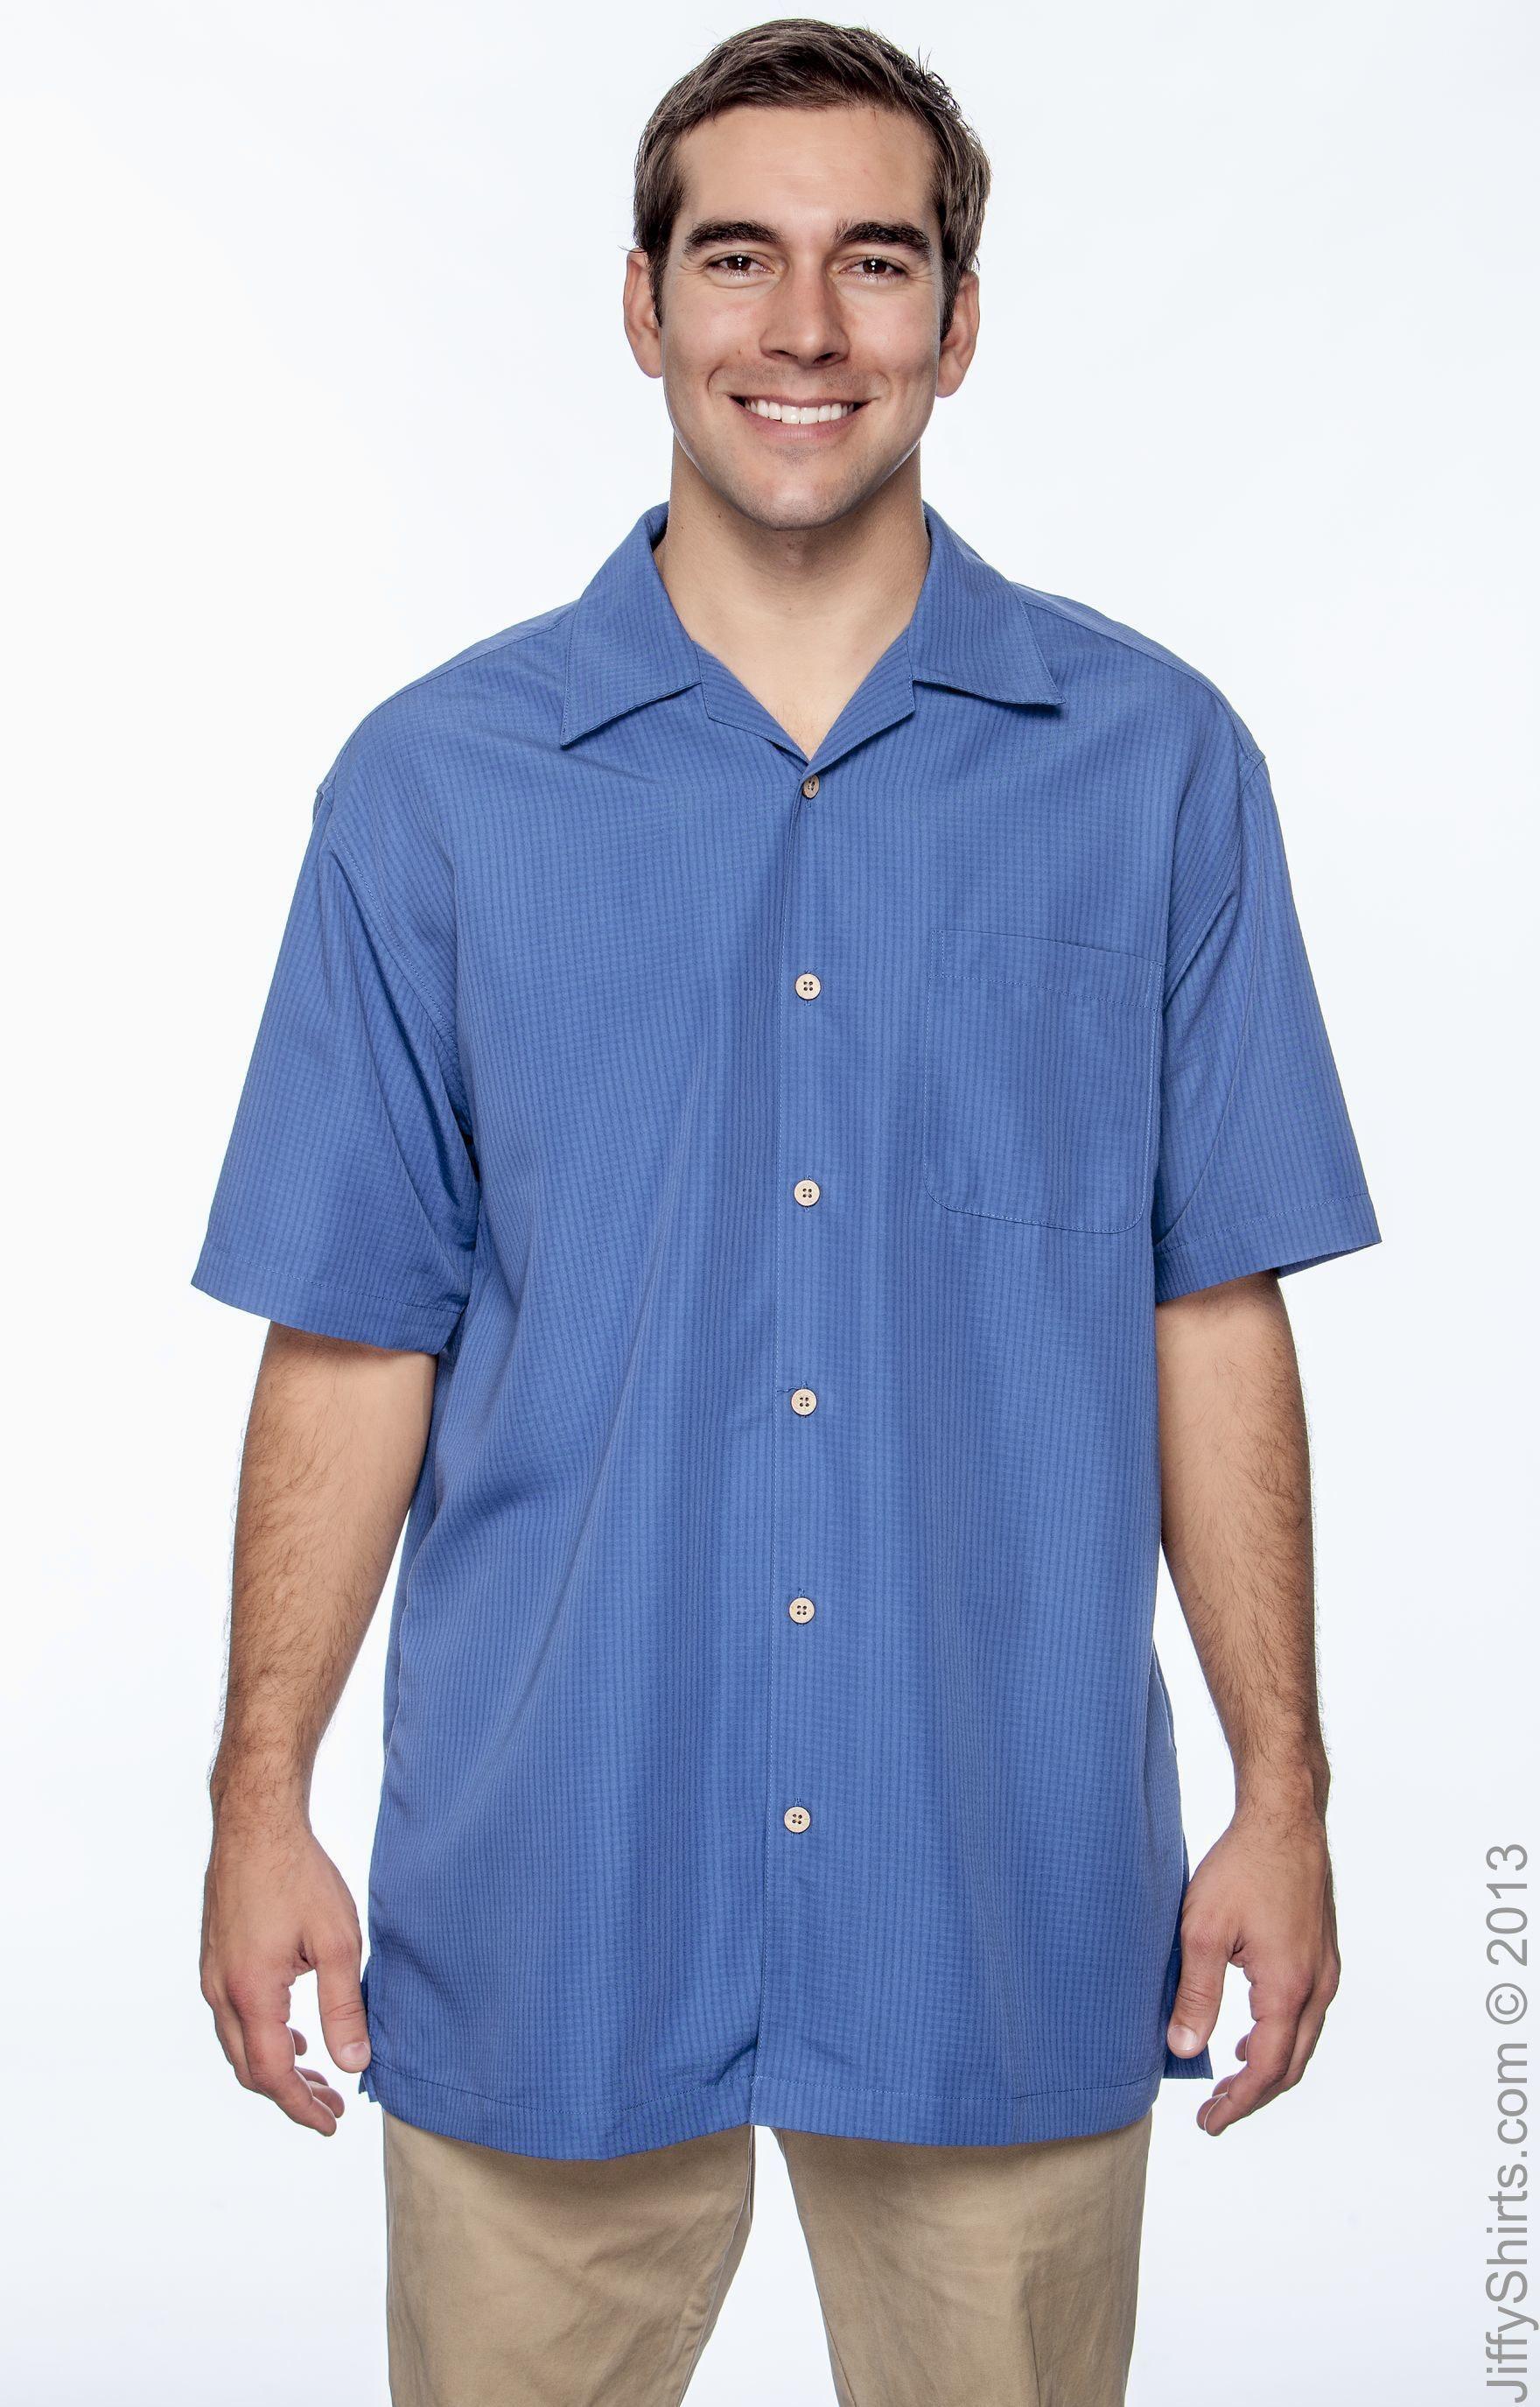 M560 - Pool Blue